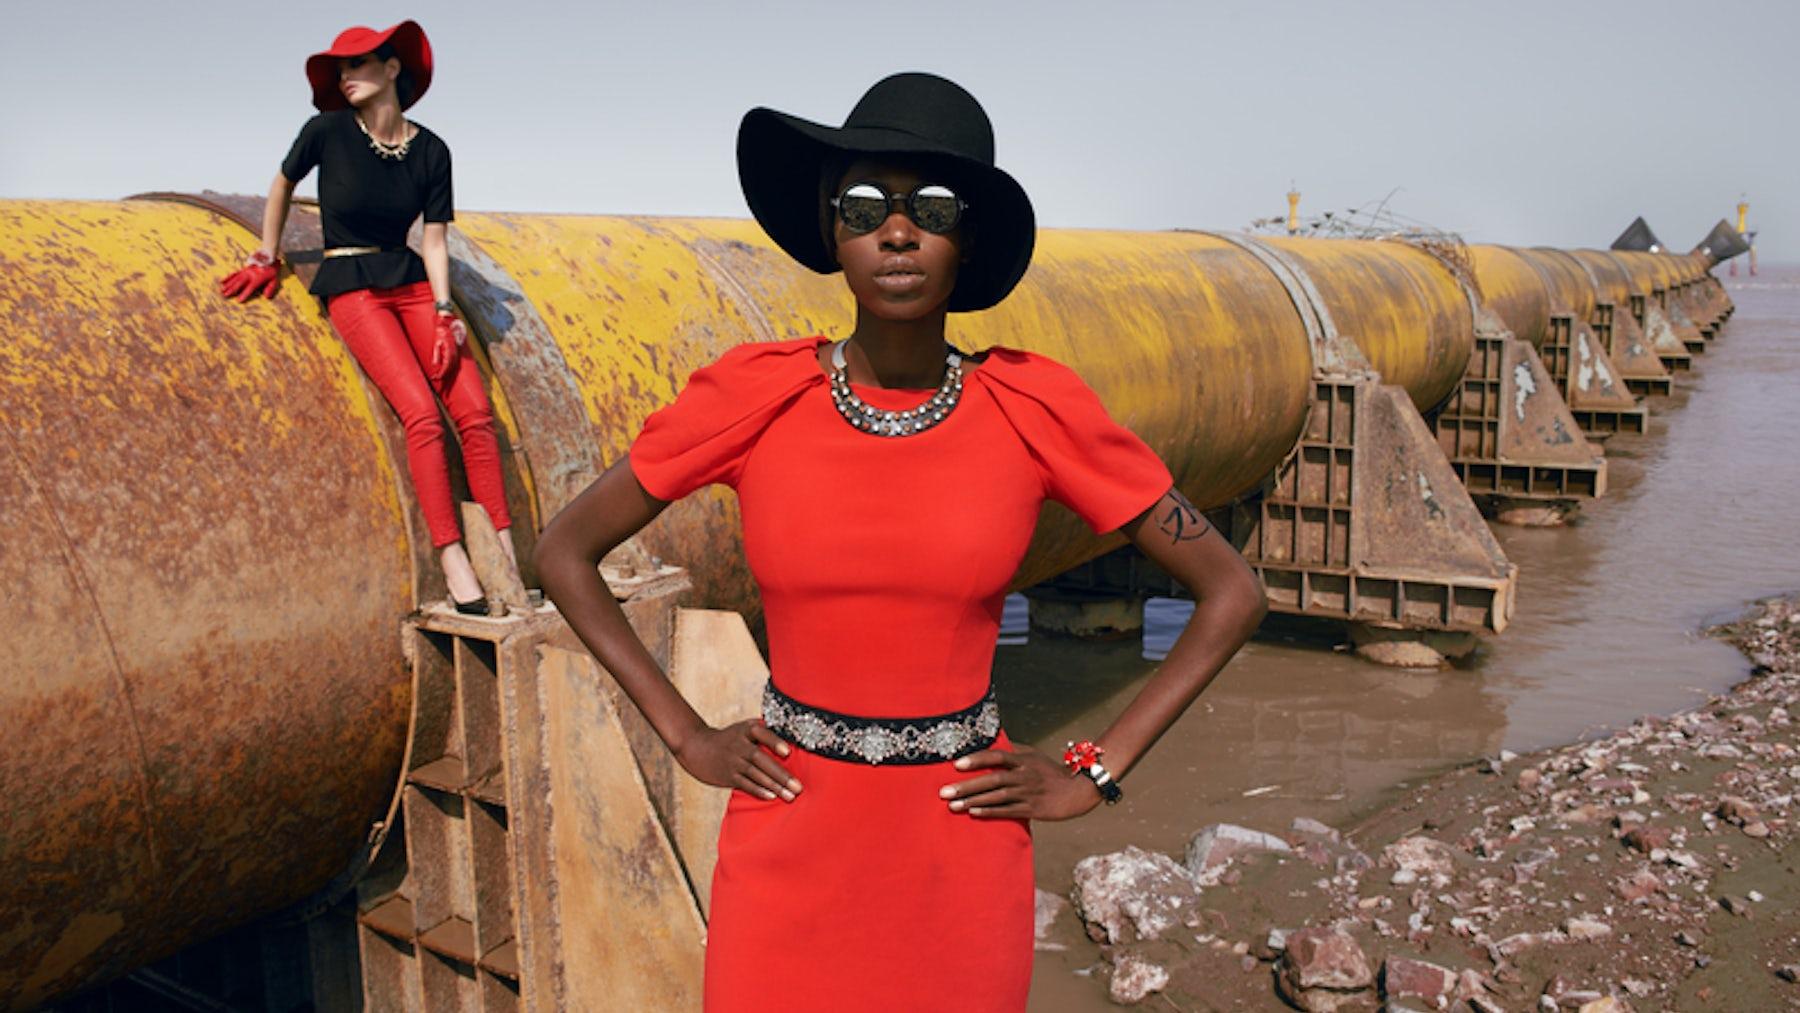 Greenpeace Report Spotlights Fashion's Progress on 'Detoxing'